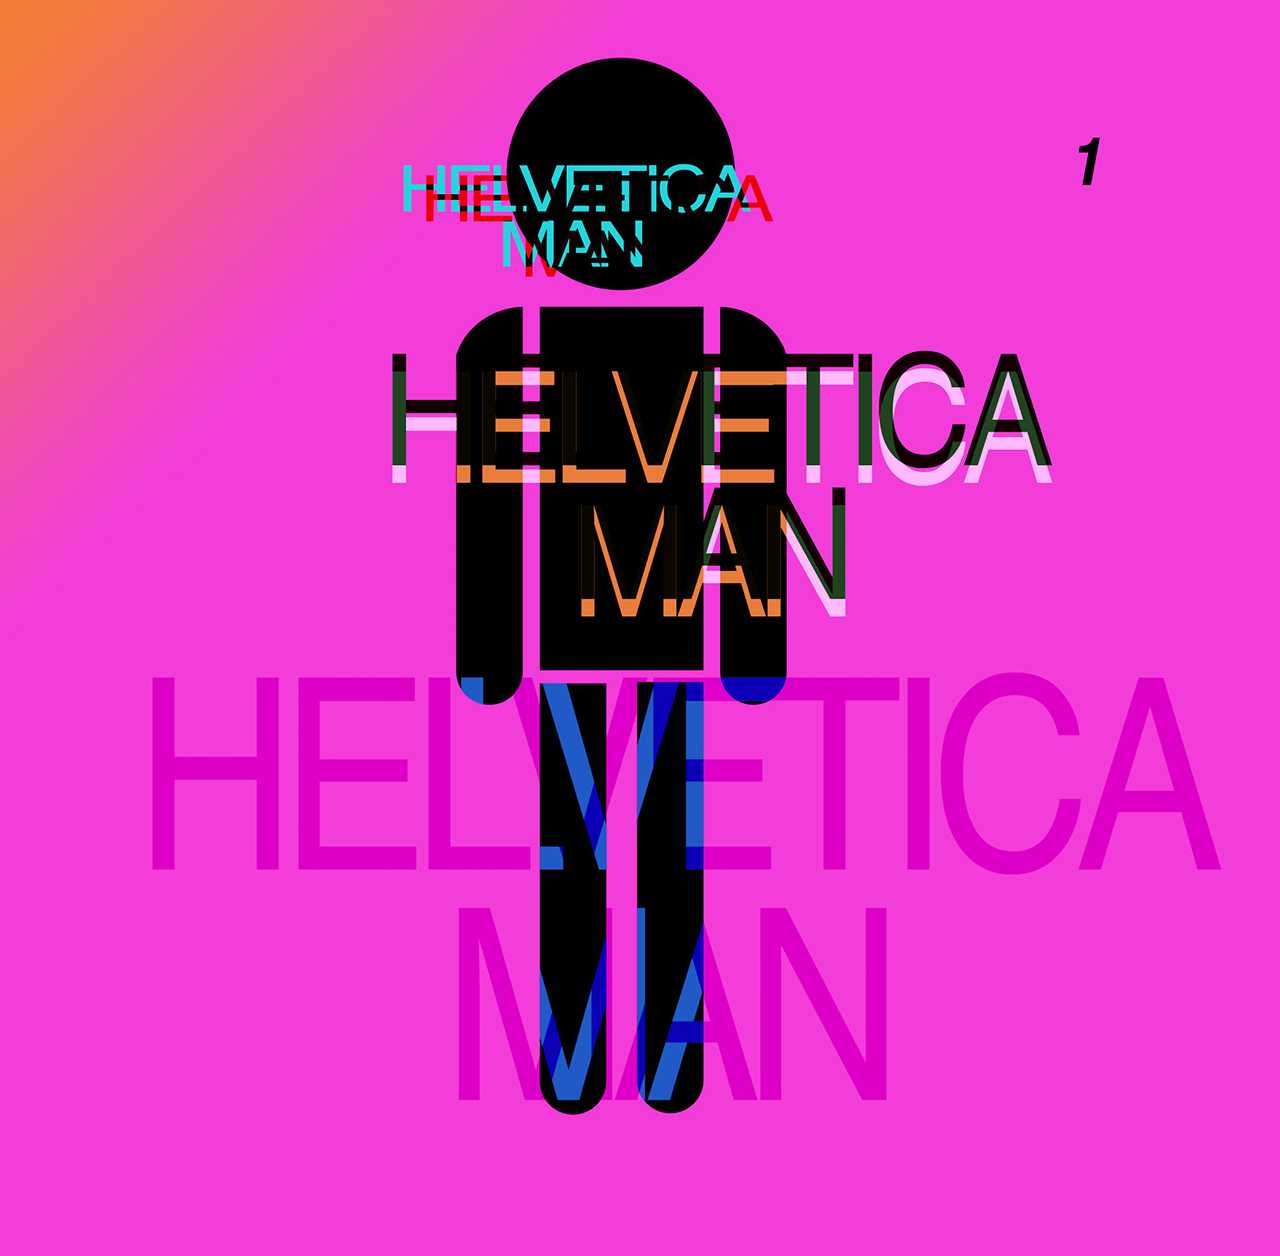 Freeport - helvetica_man_1